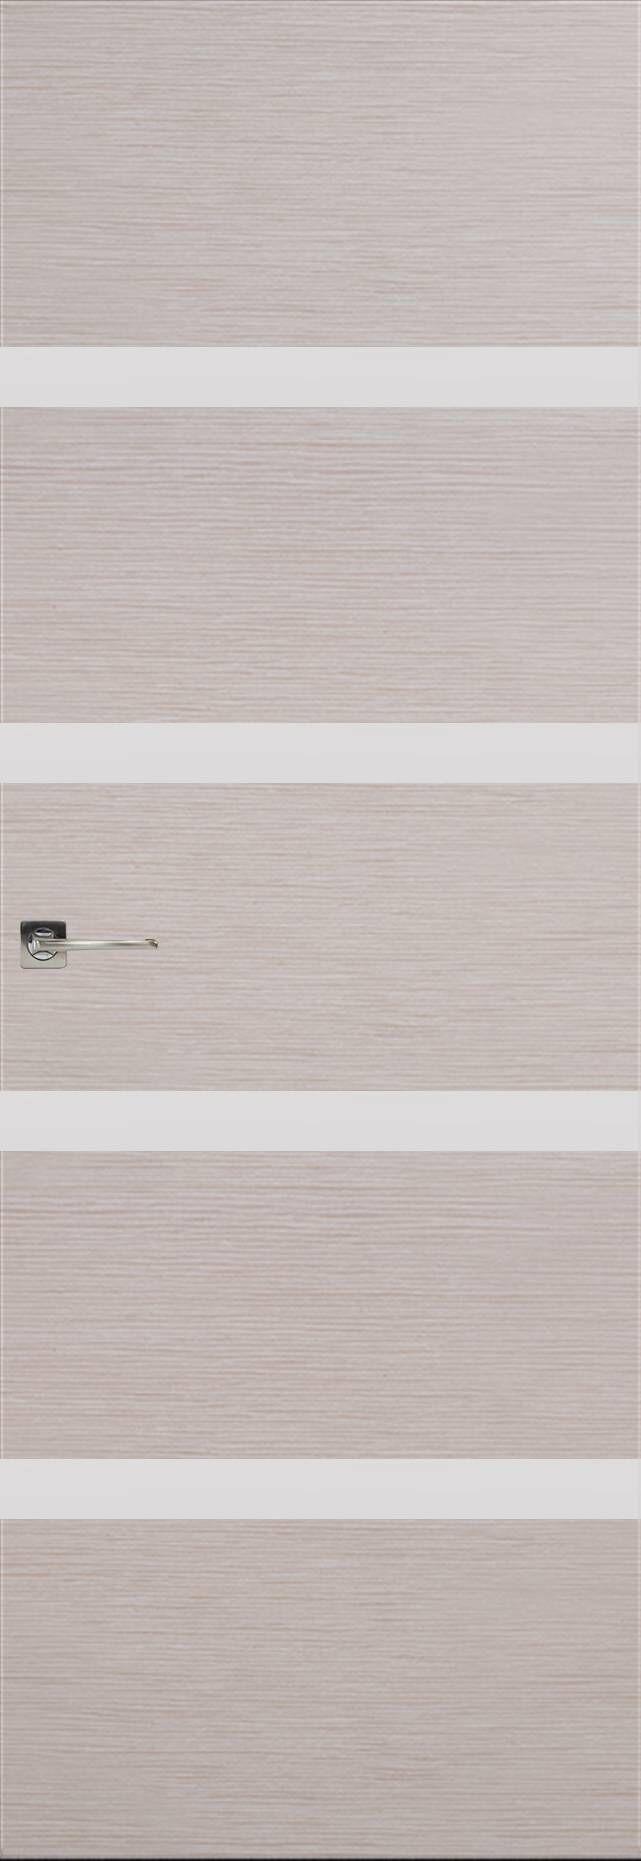 Tivoli Д-4 Невидимка цвет - Дымчатый дуб Без стекла (ДГ)